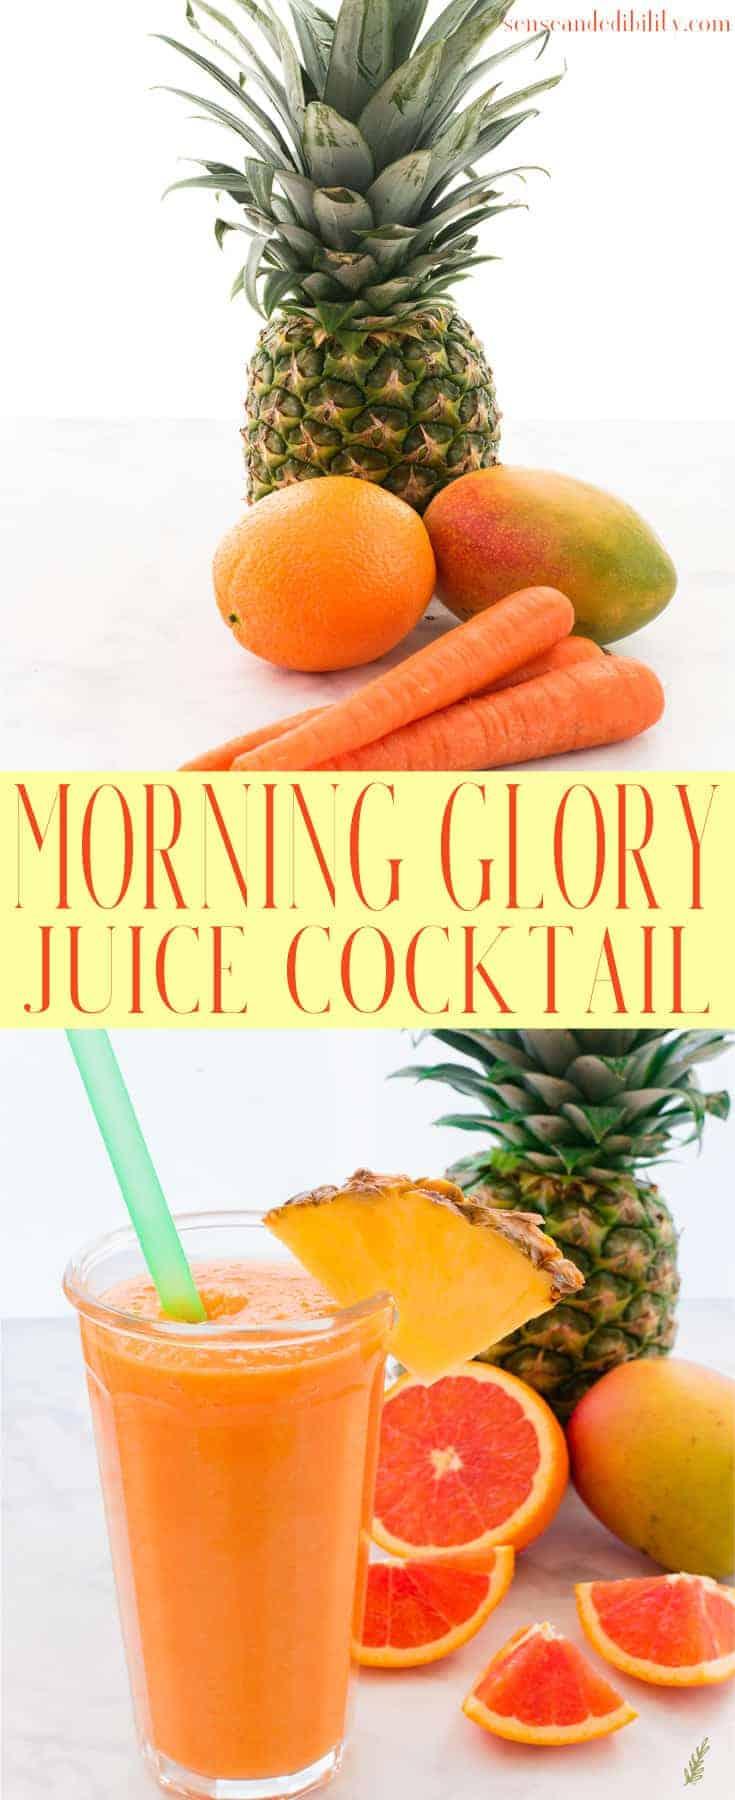 Sense & Edibility's Morning Glory Juice Cocktail Pin